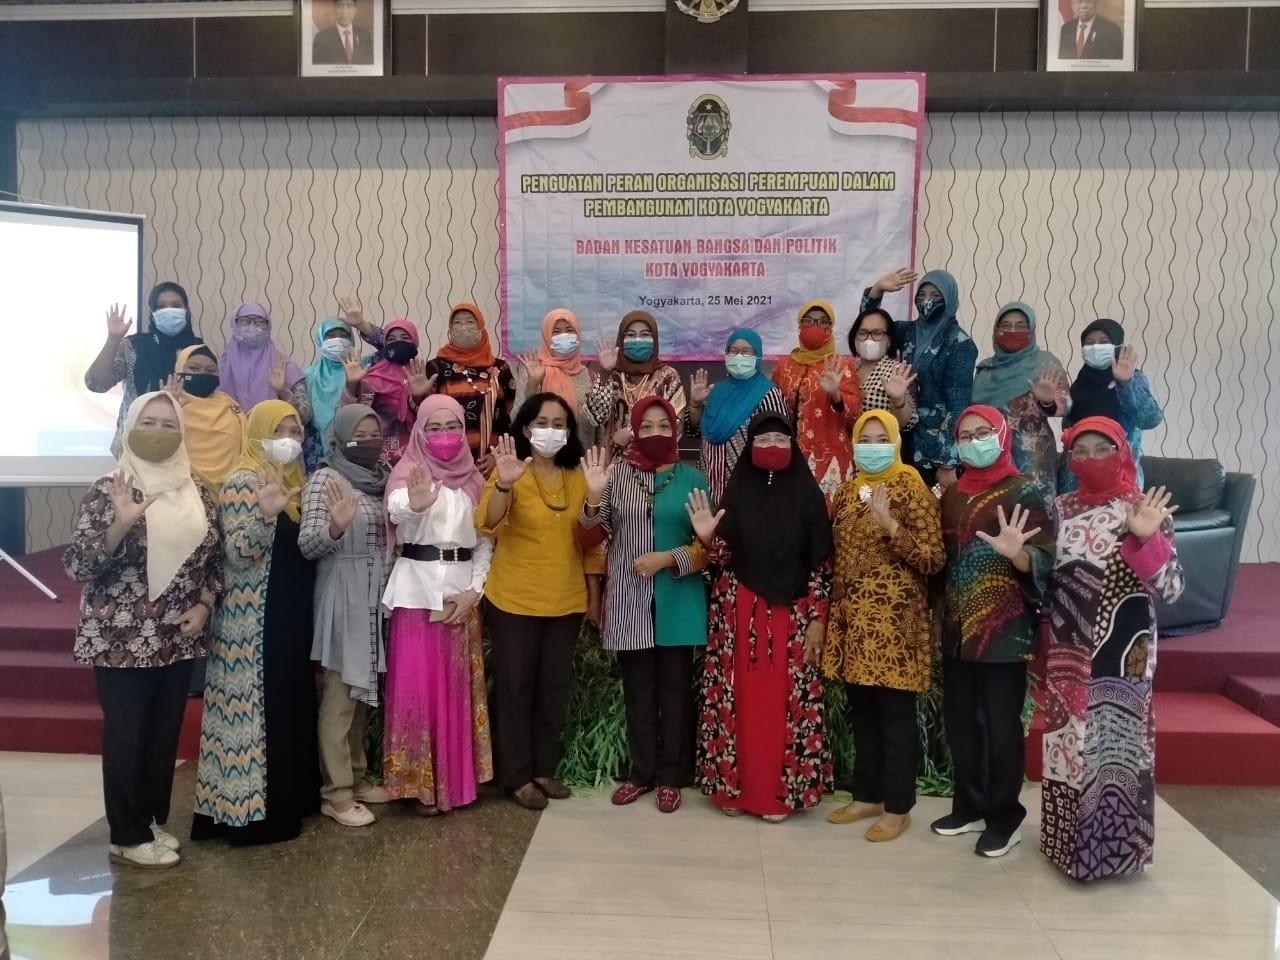 Pembinaan Organisasi Masyarakat di Kota Yogyakarta